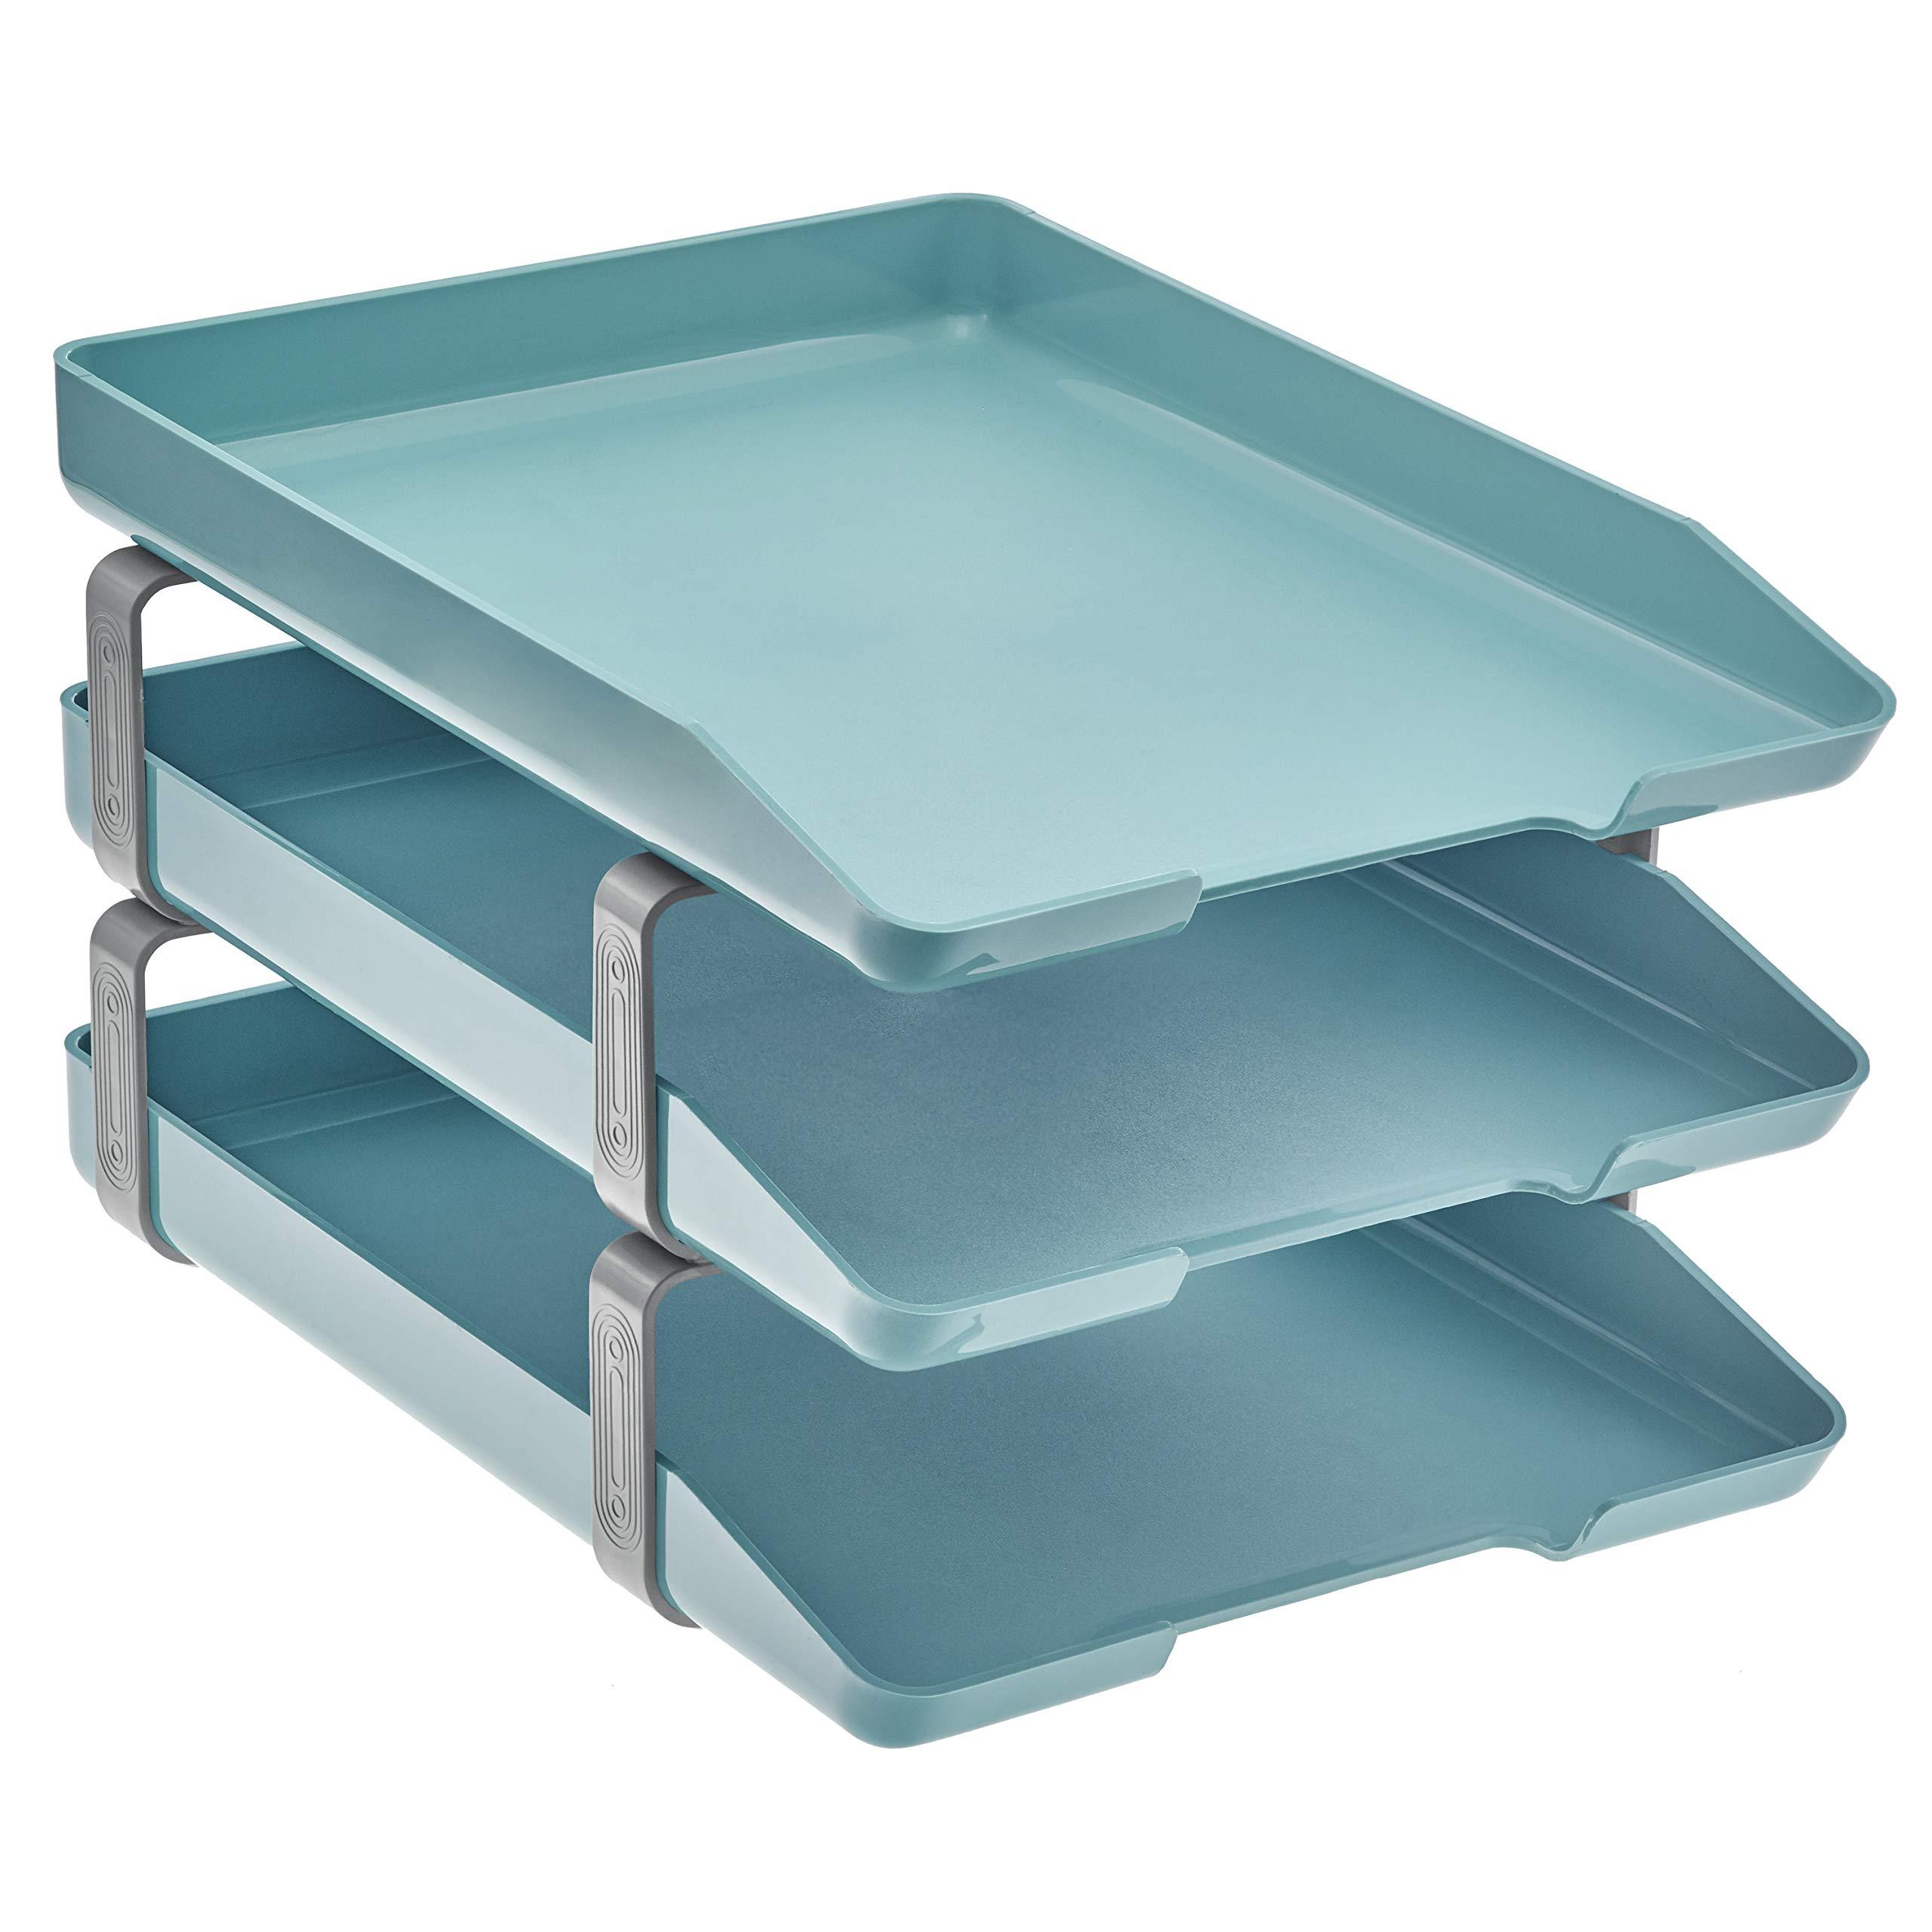 Acrimet Traditional Letter Tray 3 Tier Front Load Plastic Desktop File Organizer (Solid Green Color)